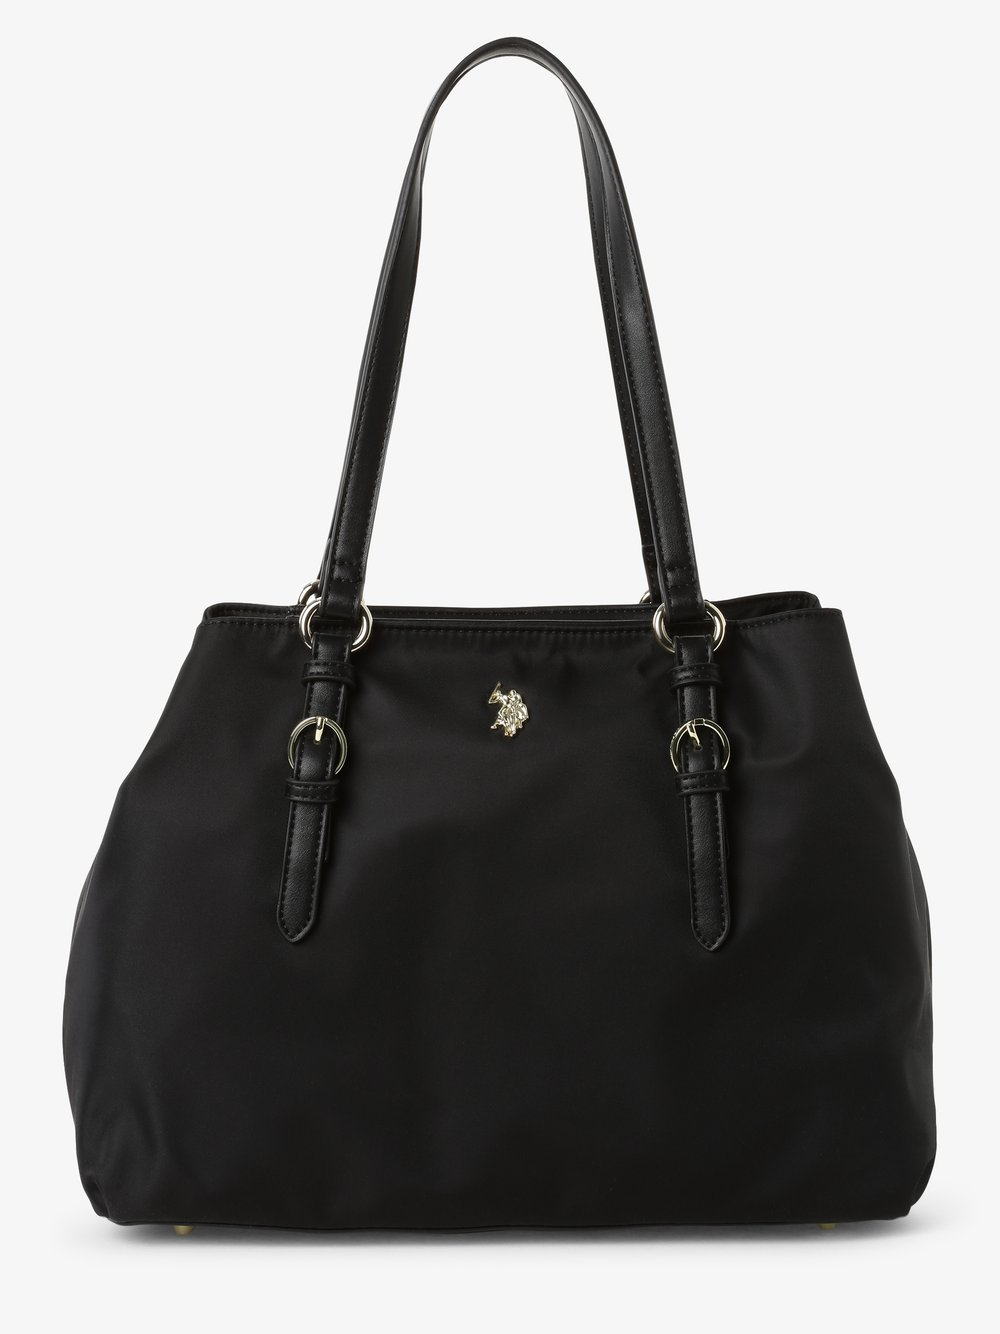 U.S. Polo Assn. – Damska torba shopper, czarny Van Graaf 485206-0002-00000